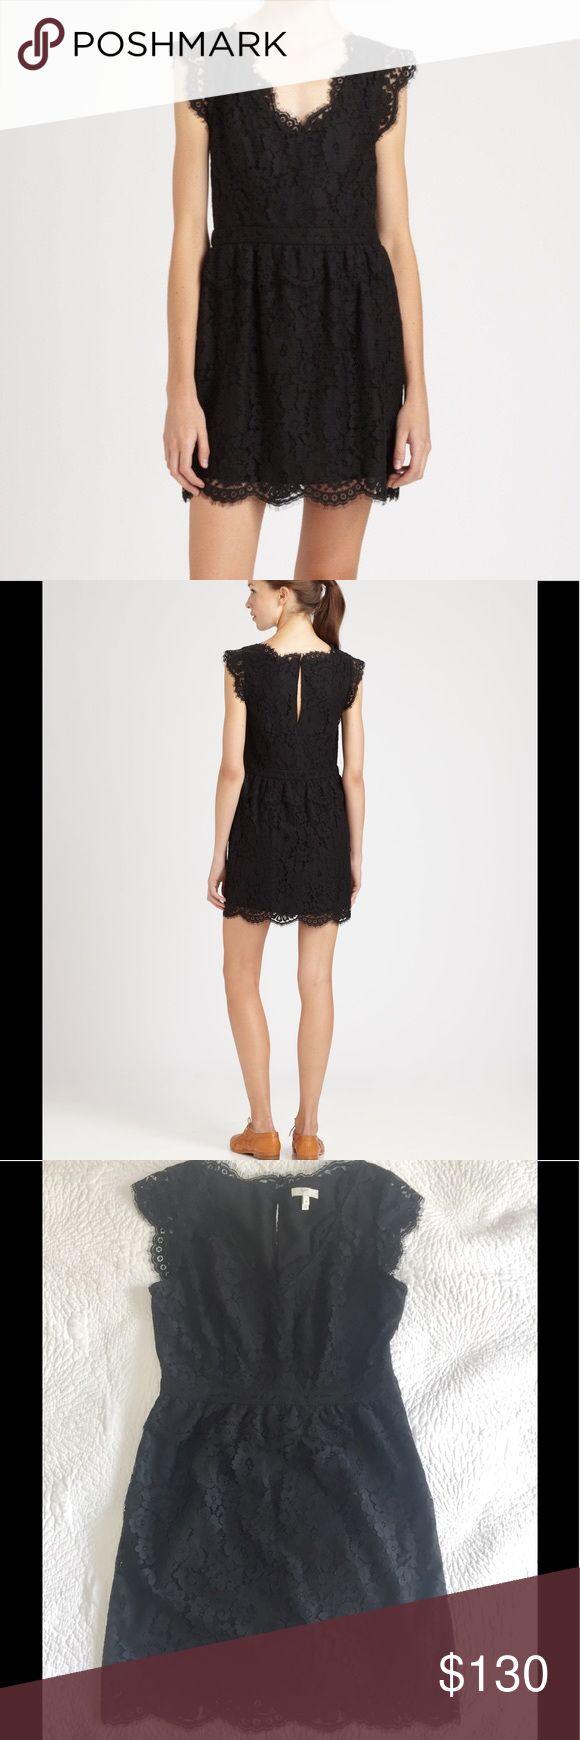 Joie Lace Black Dress Joie dress, size Medium (fits like a 6). EUC Joie Dresses Midi